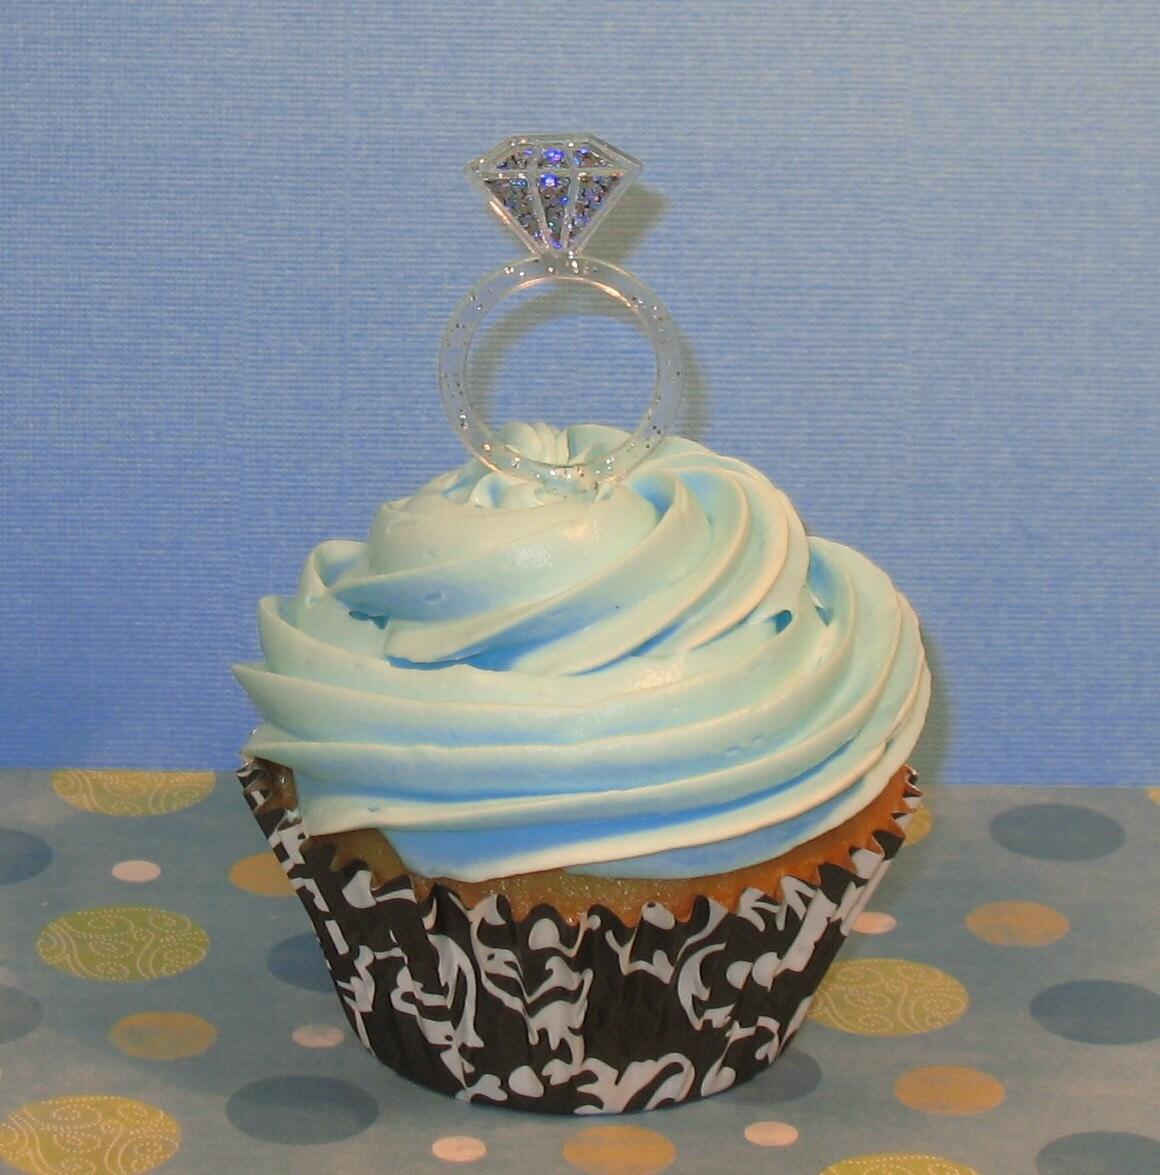 Diamond Ring Cupcake Pick 12 by sweettreatssupplies on Etsy